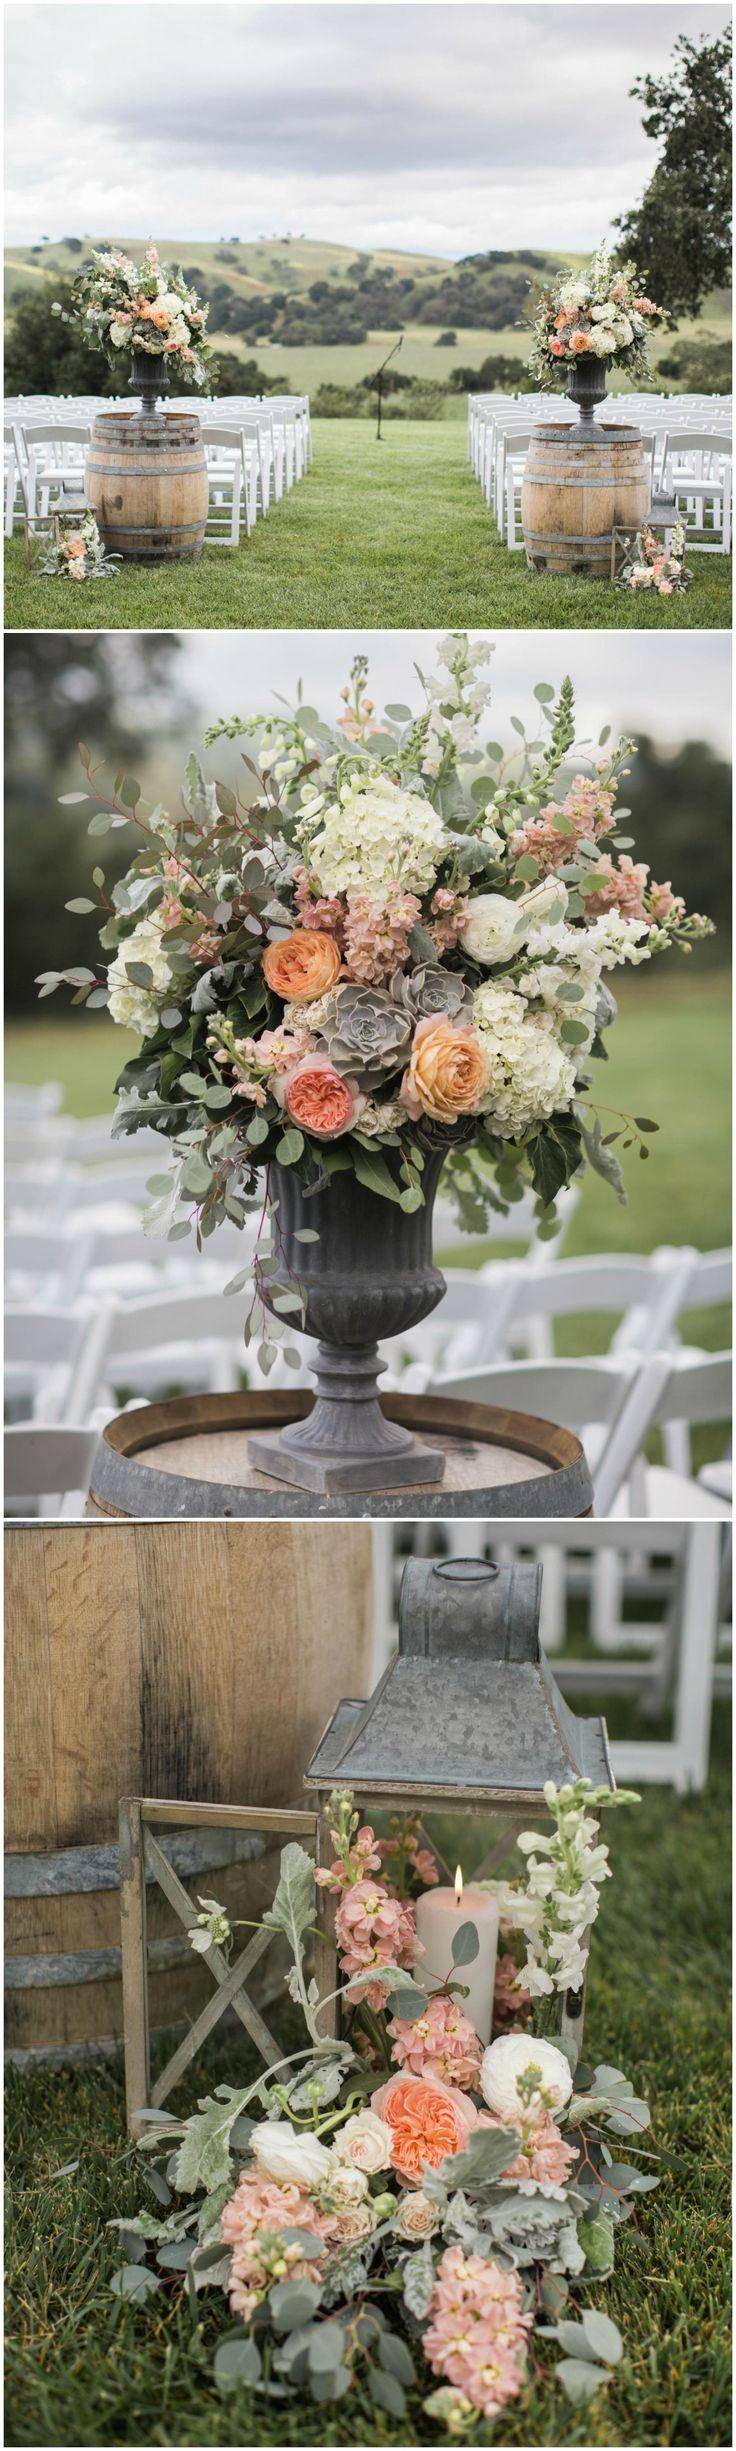 Winery wedding, ceremony ideas, wine barrels, lanterns, flowers, rustic romance // Anna J Photography